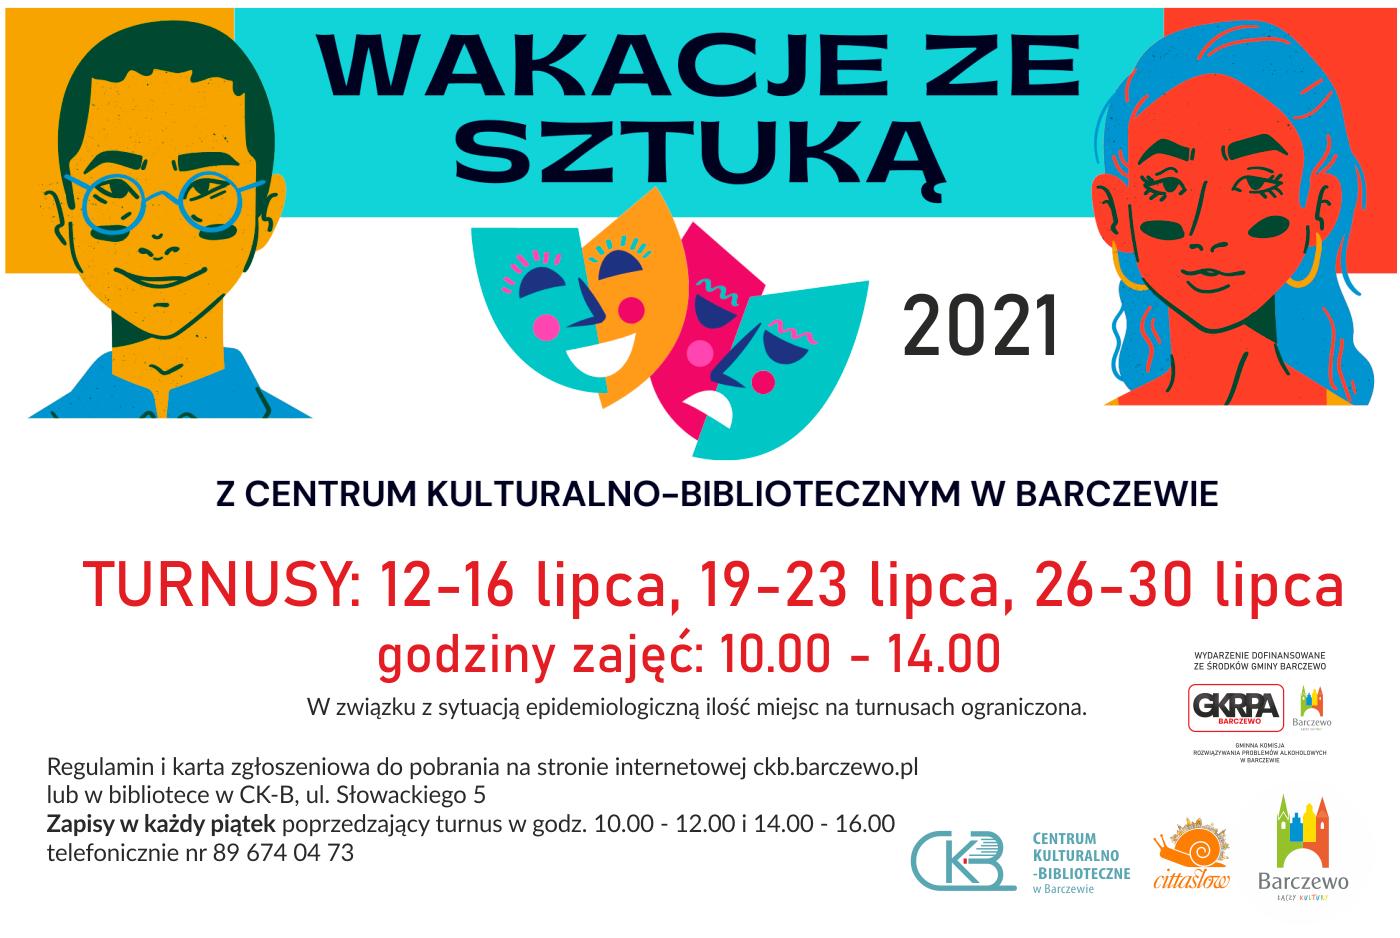 AKCJA LATO 2021